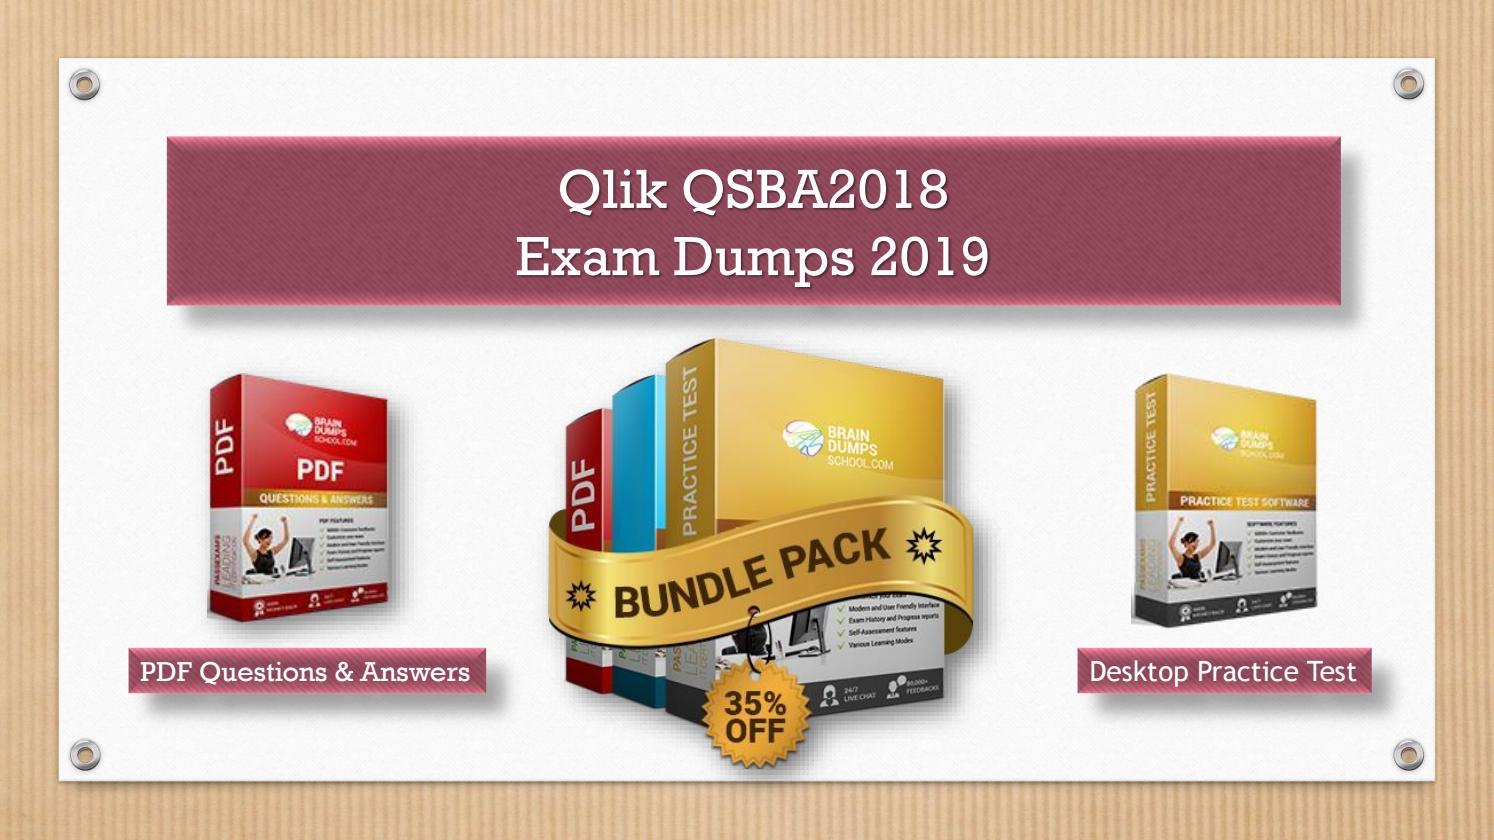 Pass QSBA2018 Exam with New Qlik QSBA2018 Dumps by Levi